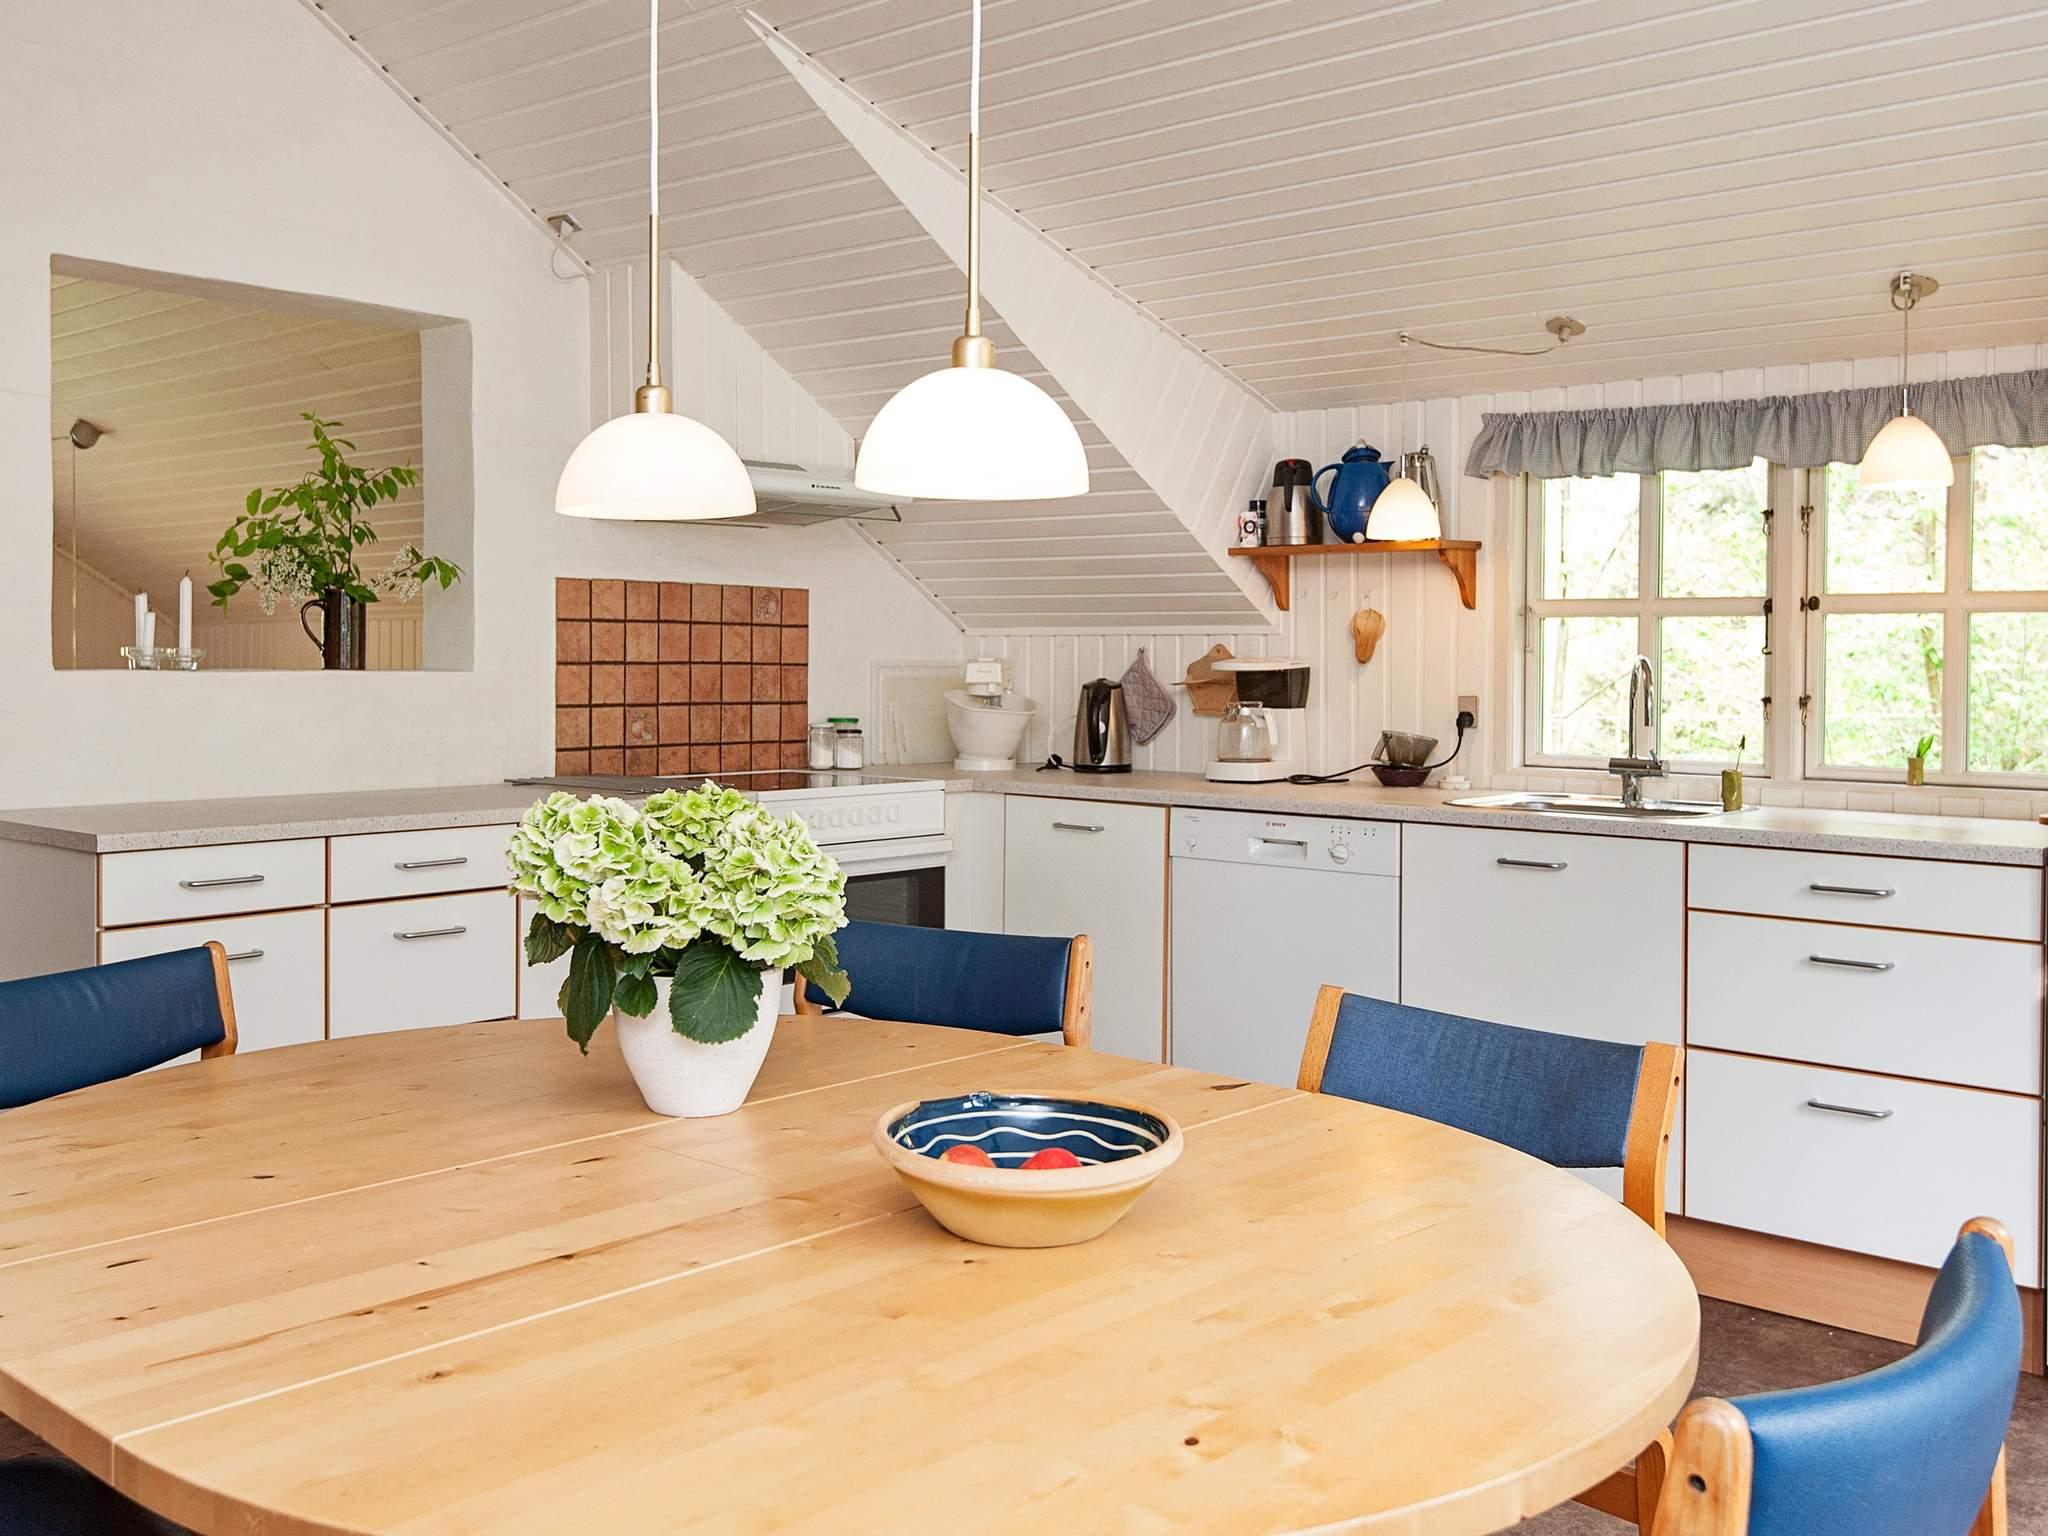 Ferienhaus Ry (83836), Ry, , Ostjütland, Dänemark, Bild 11